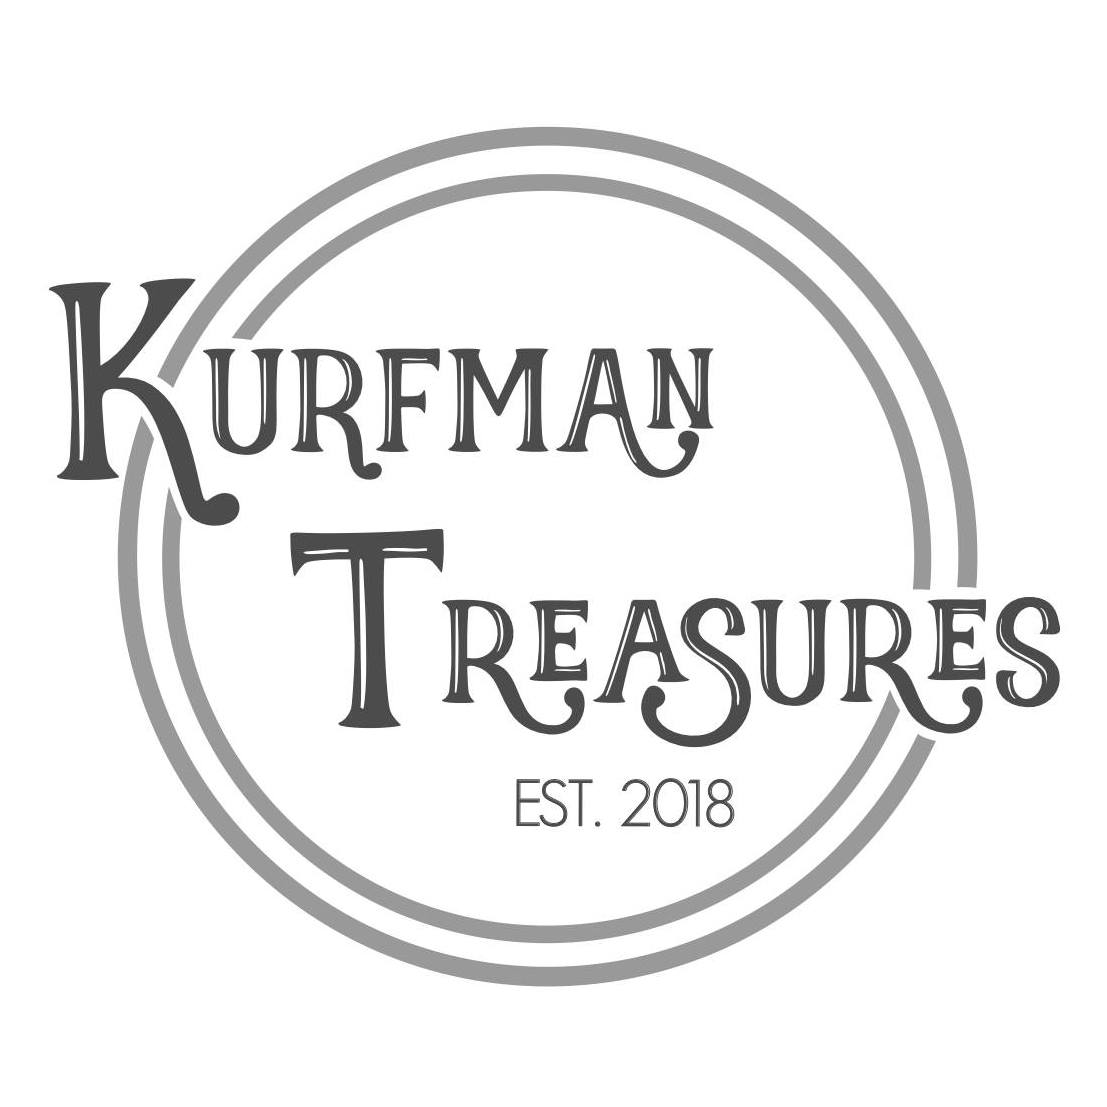 Kurfman Treasures image